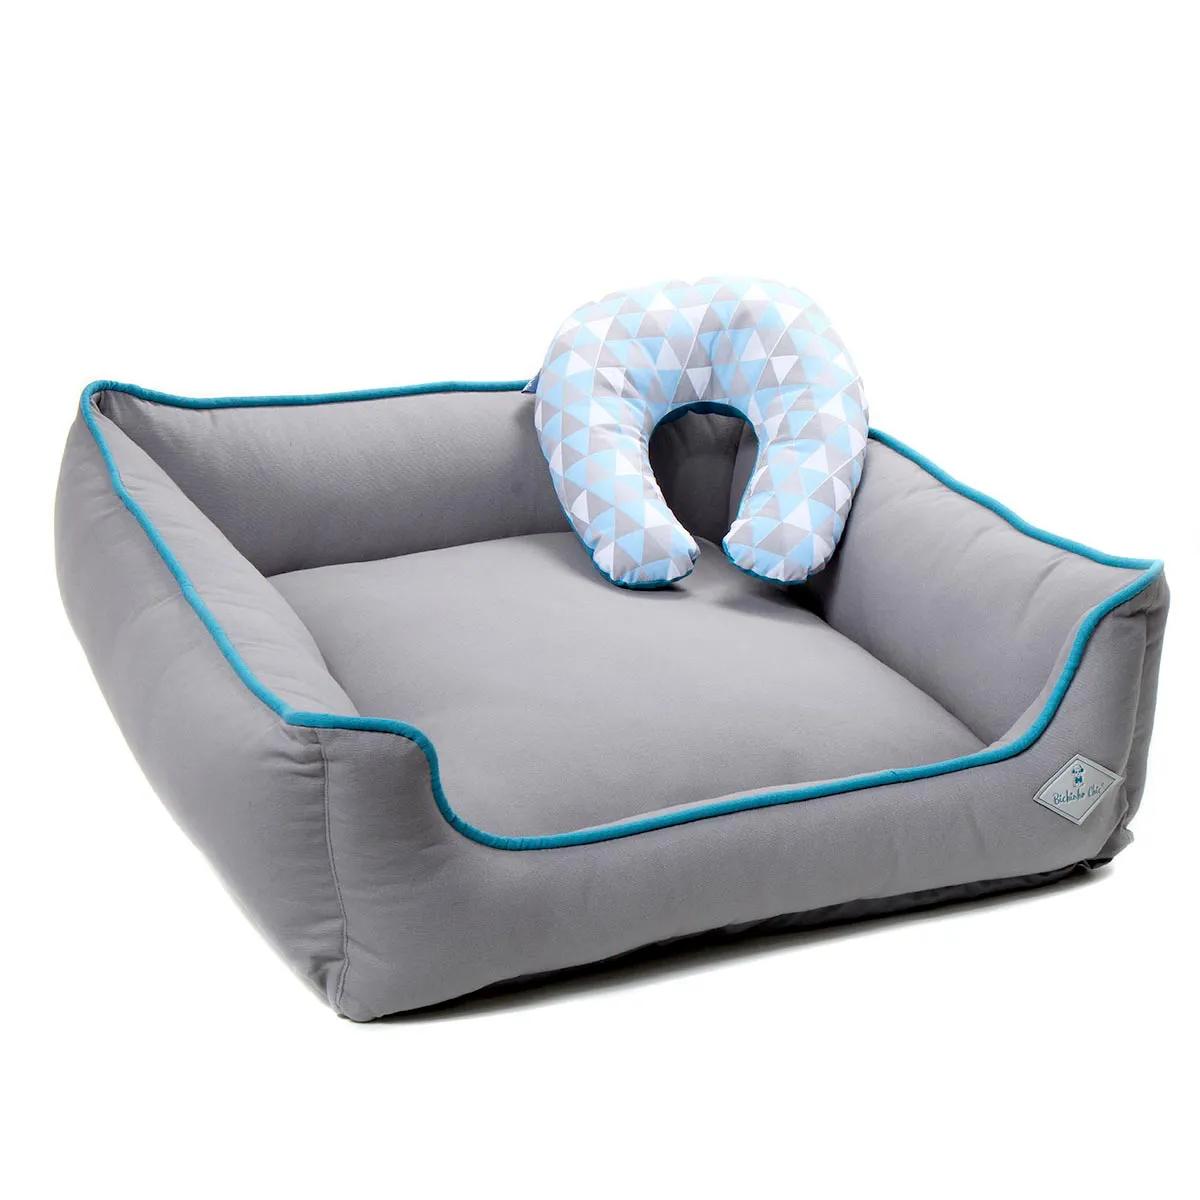 Cama para Cachorro e Gato Baby Bichinho Chic Azul